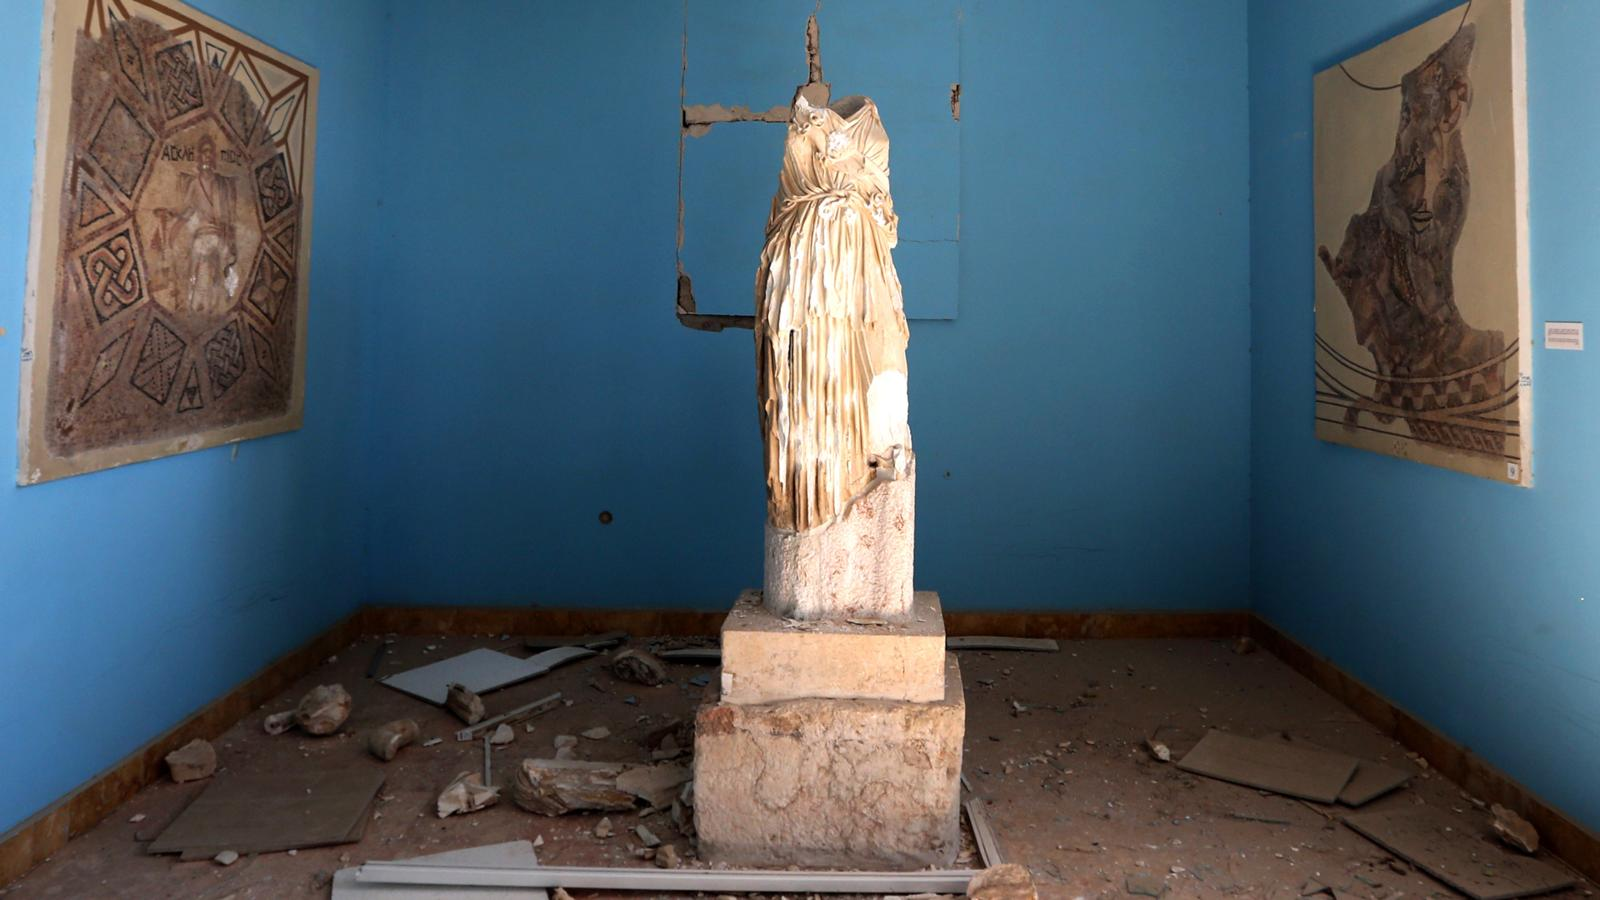 008 - SYRIA-CONFLICT-HERITAGE-PALMYRA